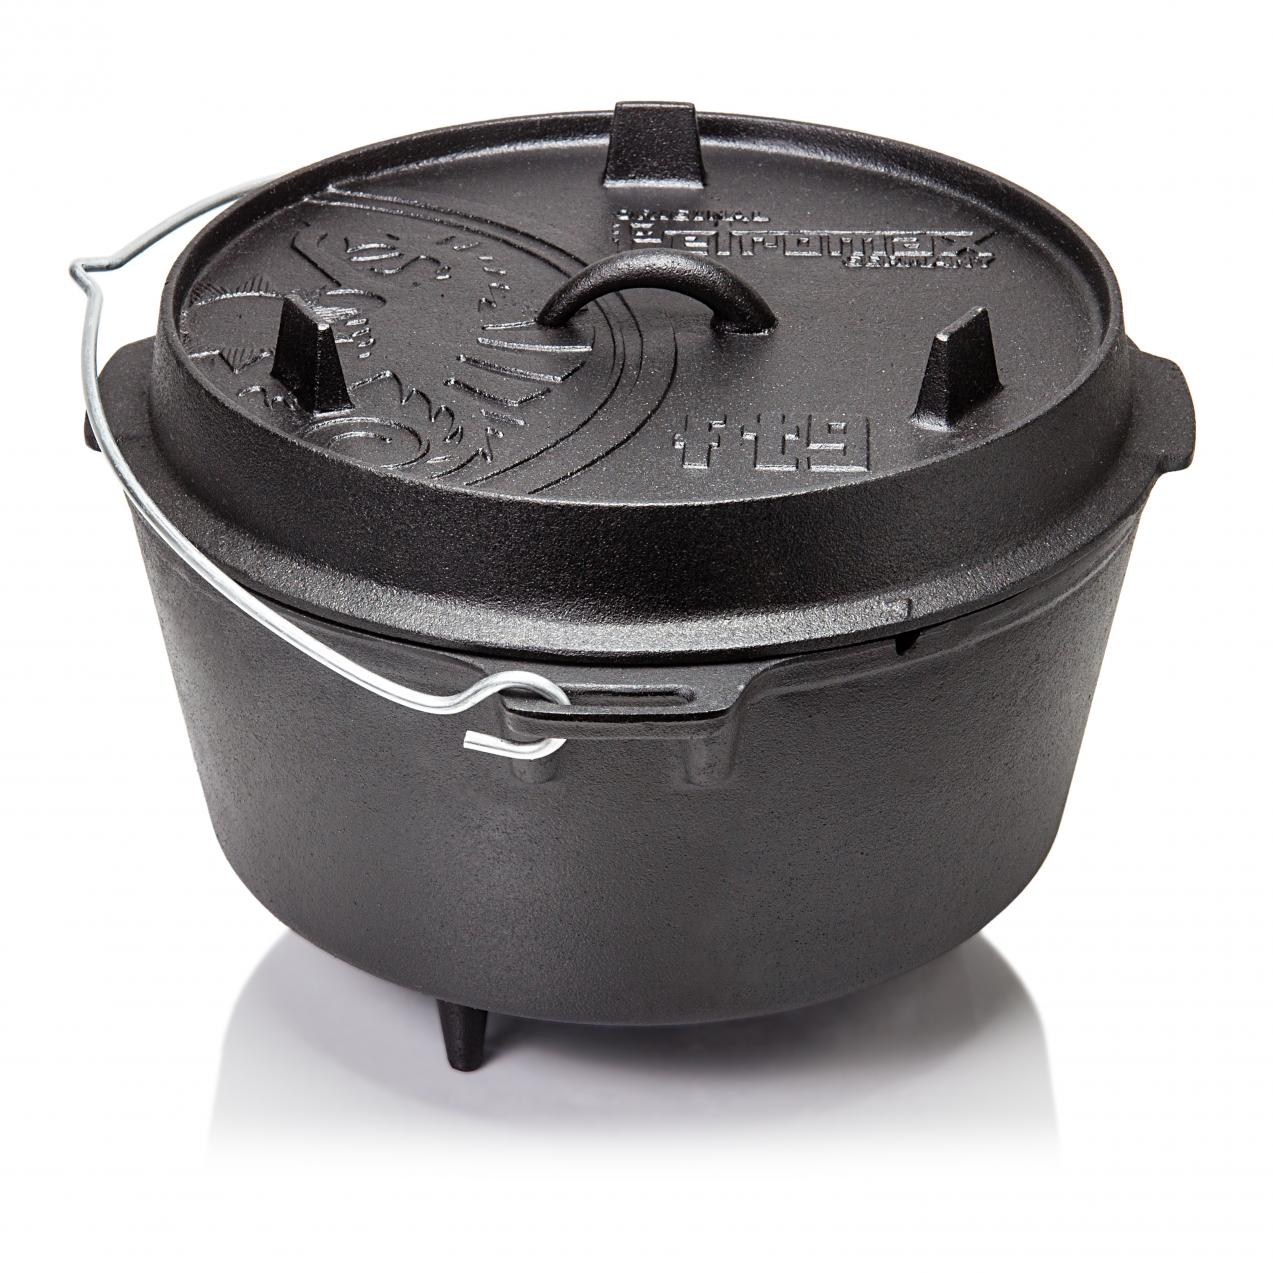 Petromax Dutch Oven ft18 ohne Füße